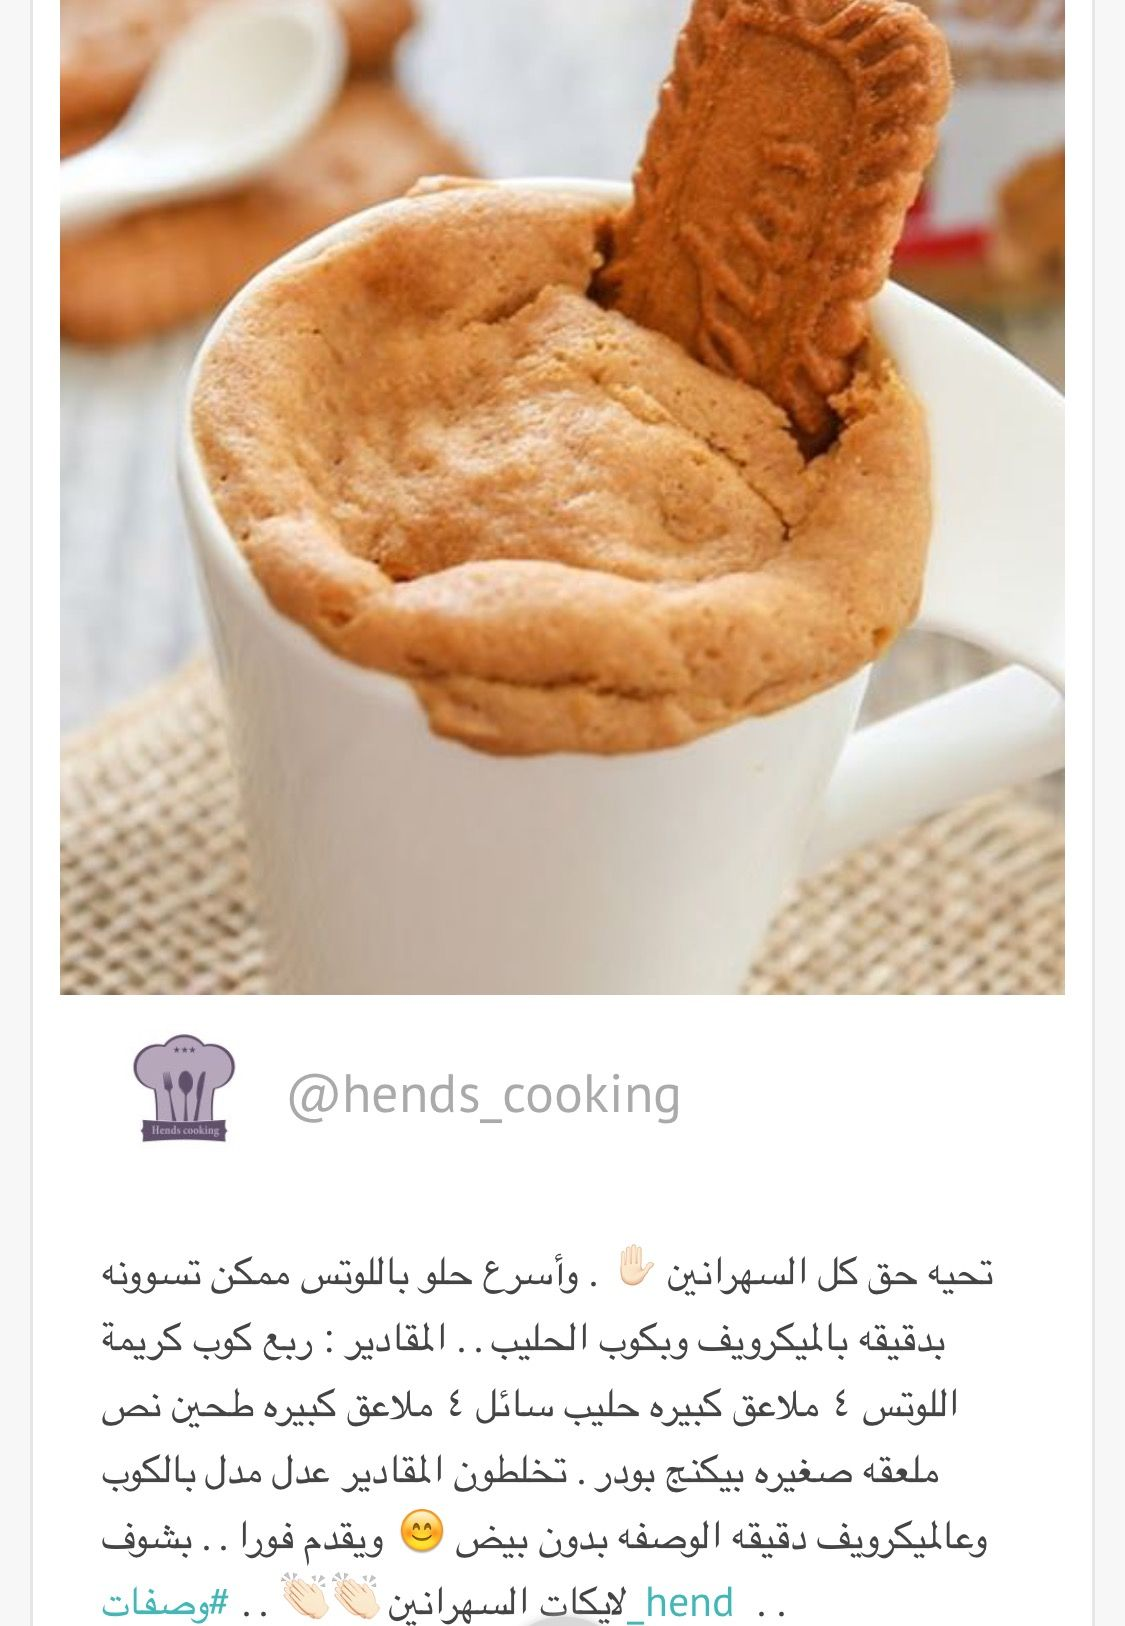 كيكة اللوتس يدون بيض Cooking Microwave Cake Food